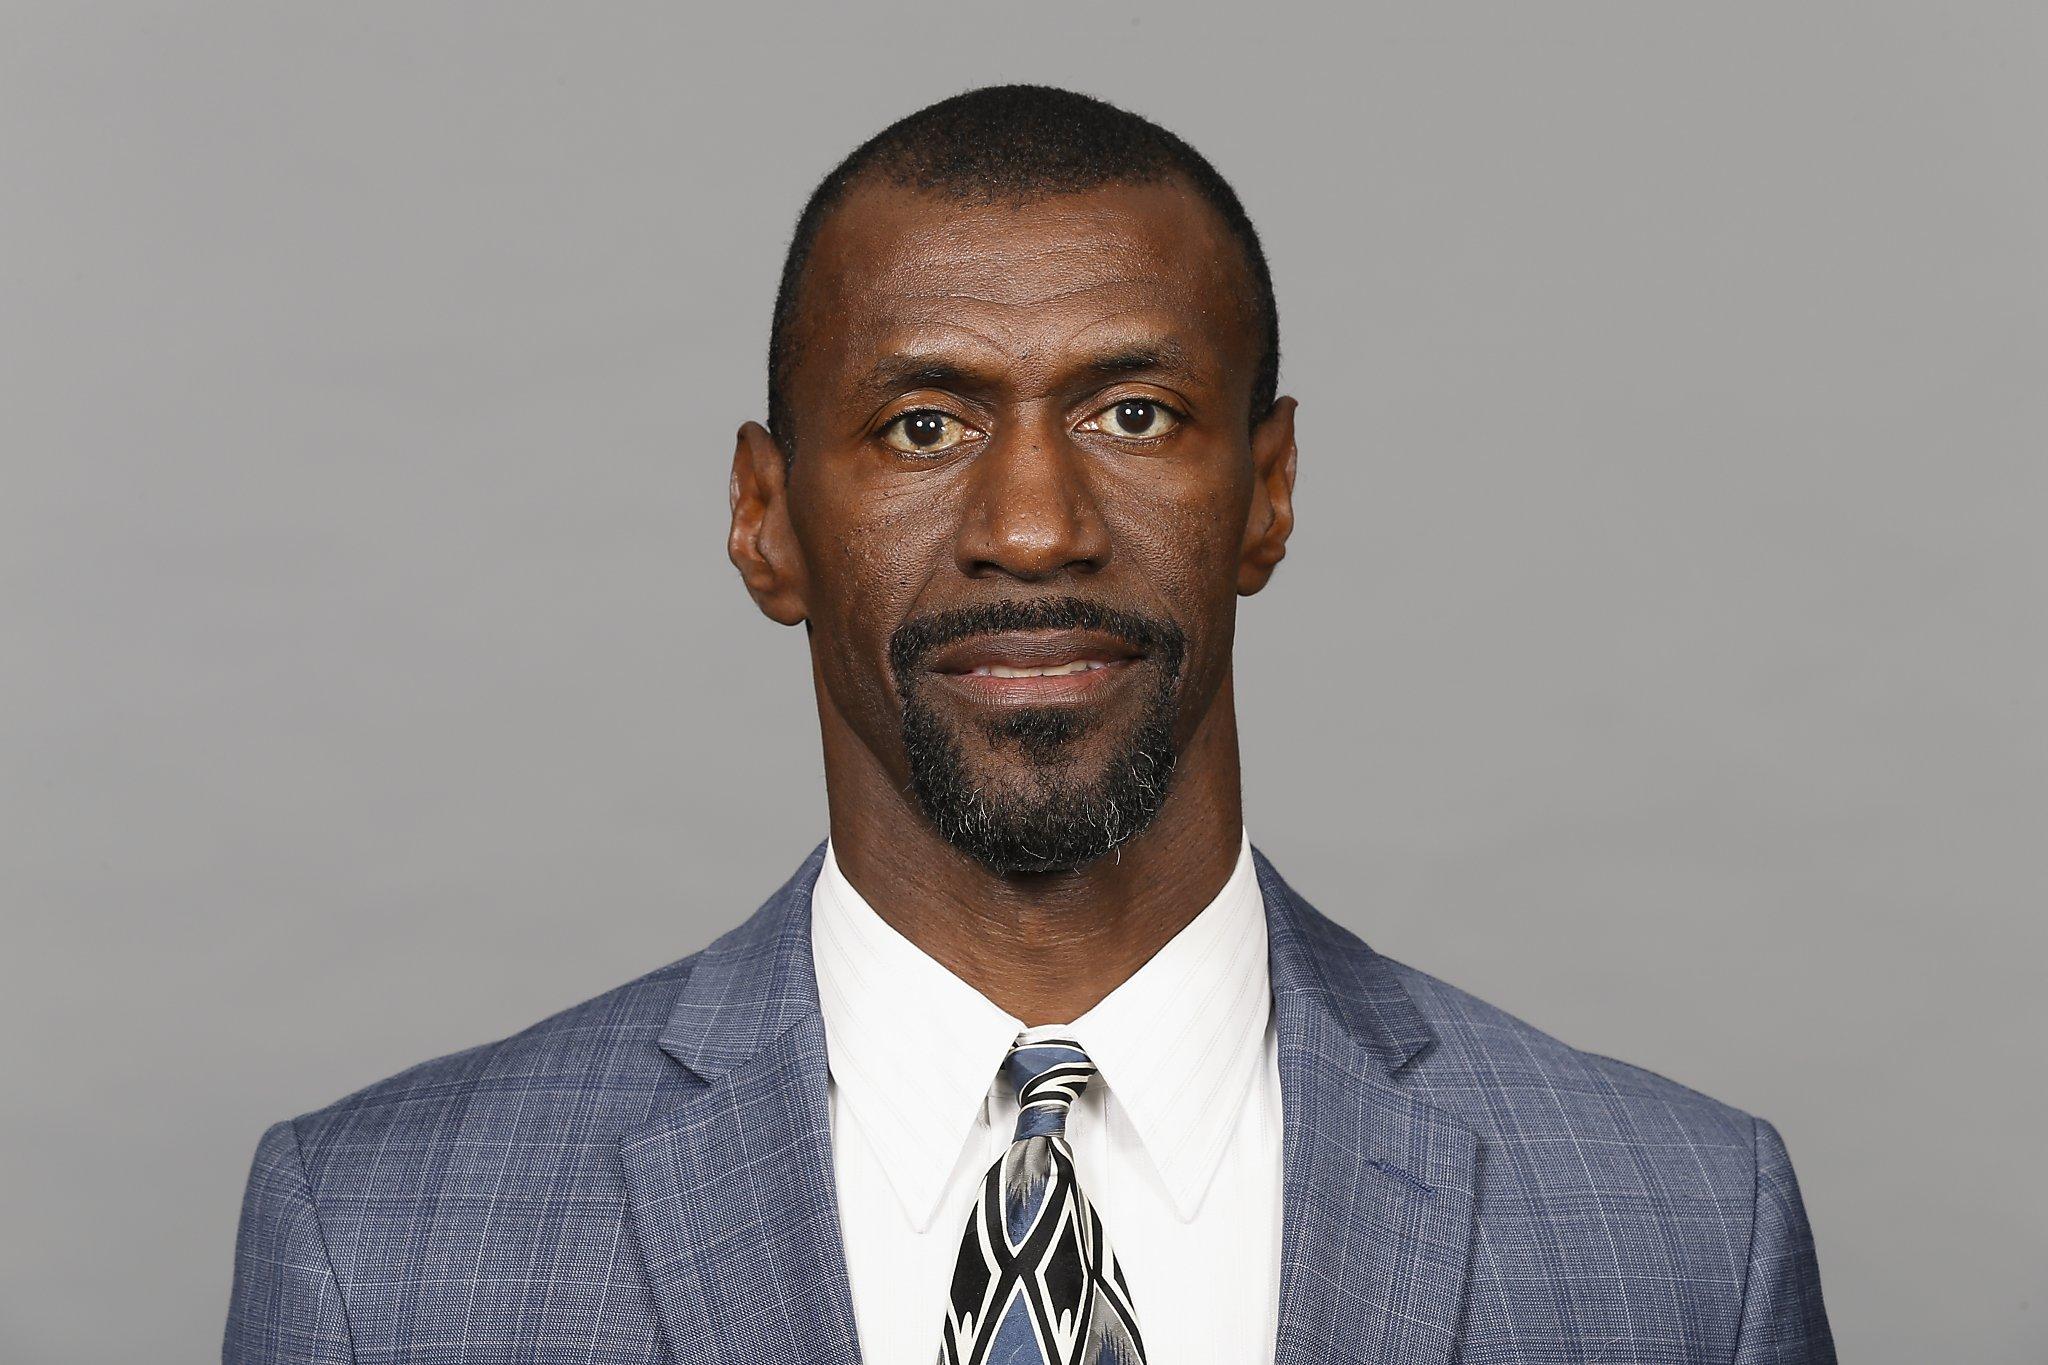 Markus Paul, Cowboys' strength coach, dies at 54